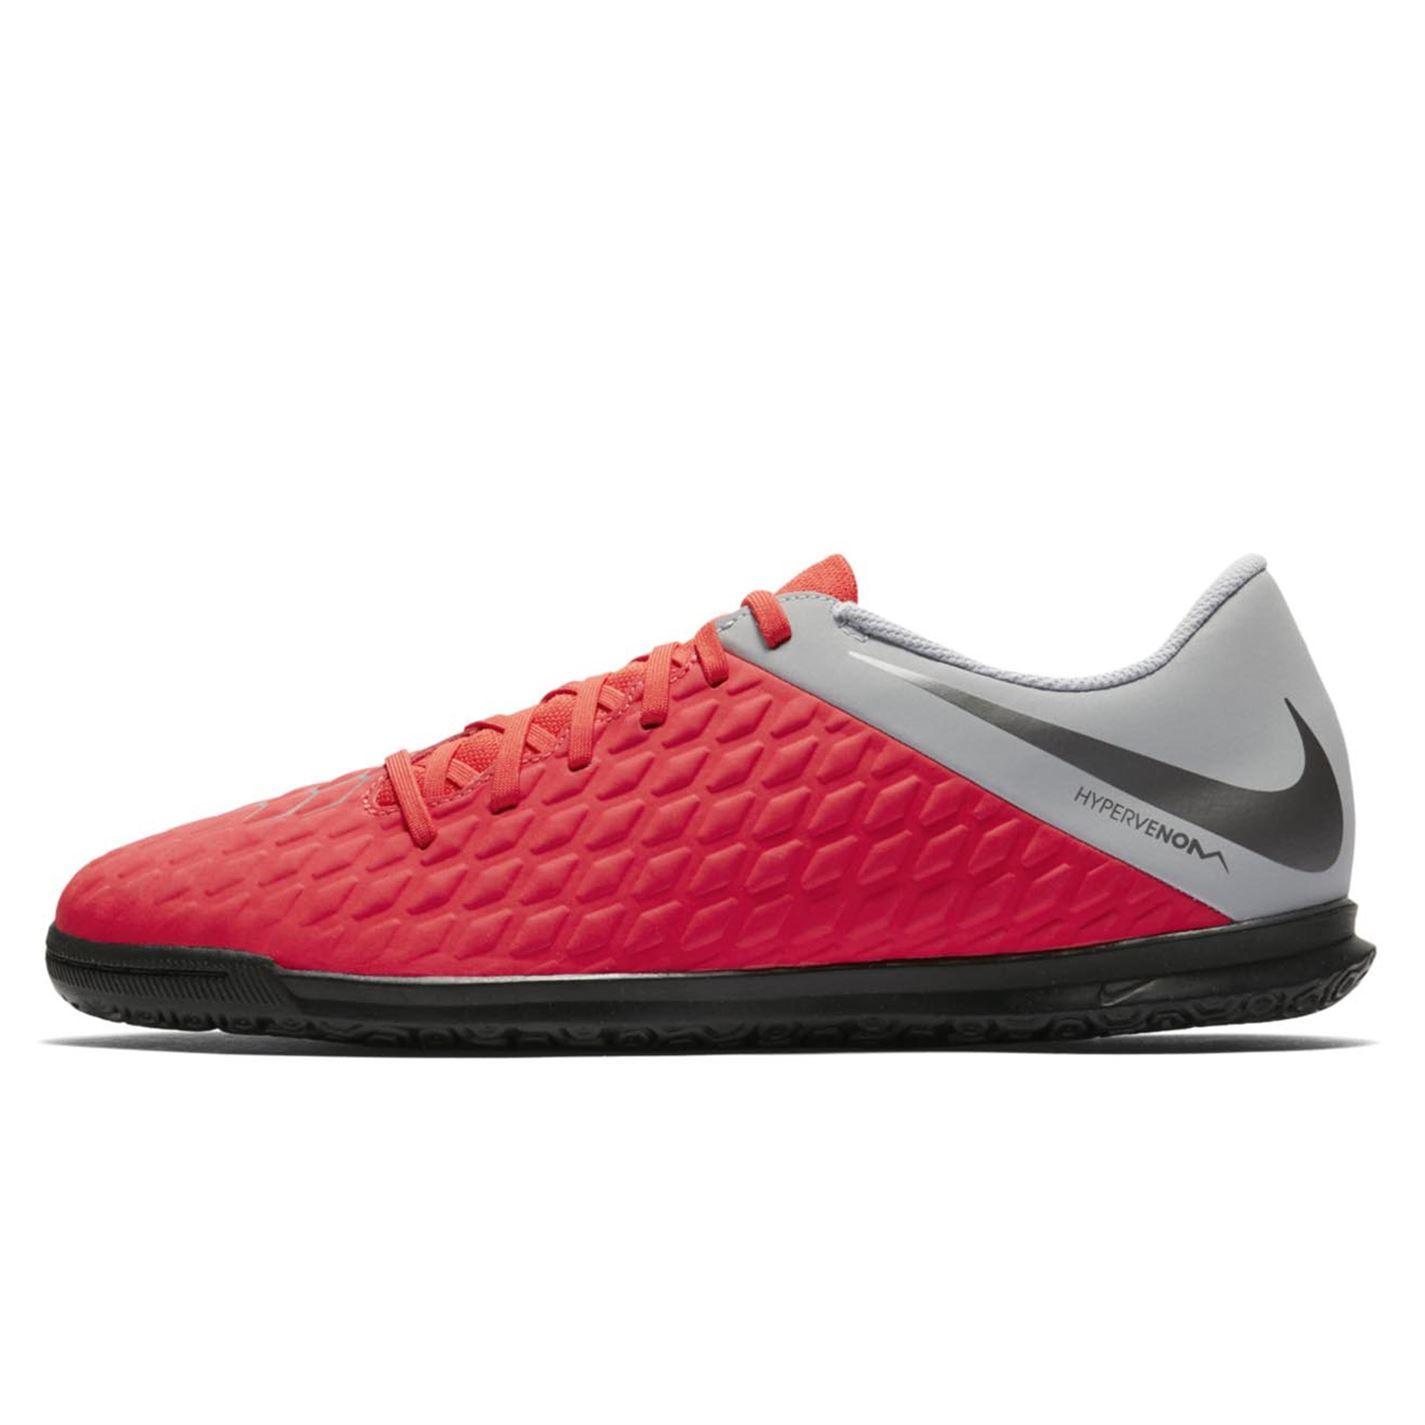 scarpe da ginnastica da uomo nike